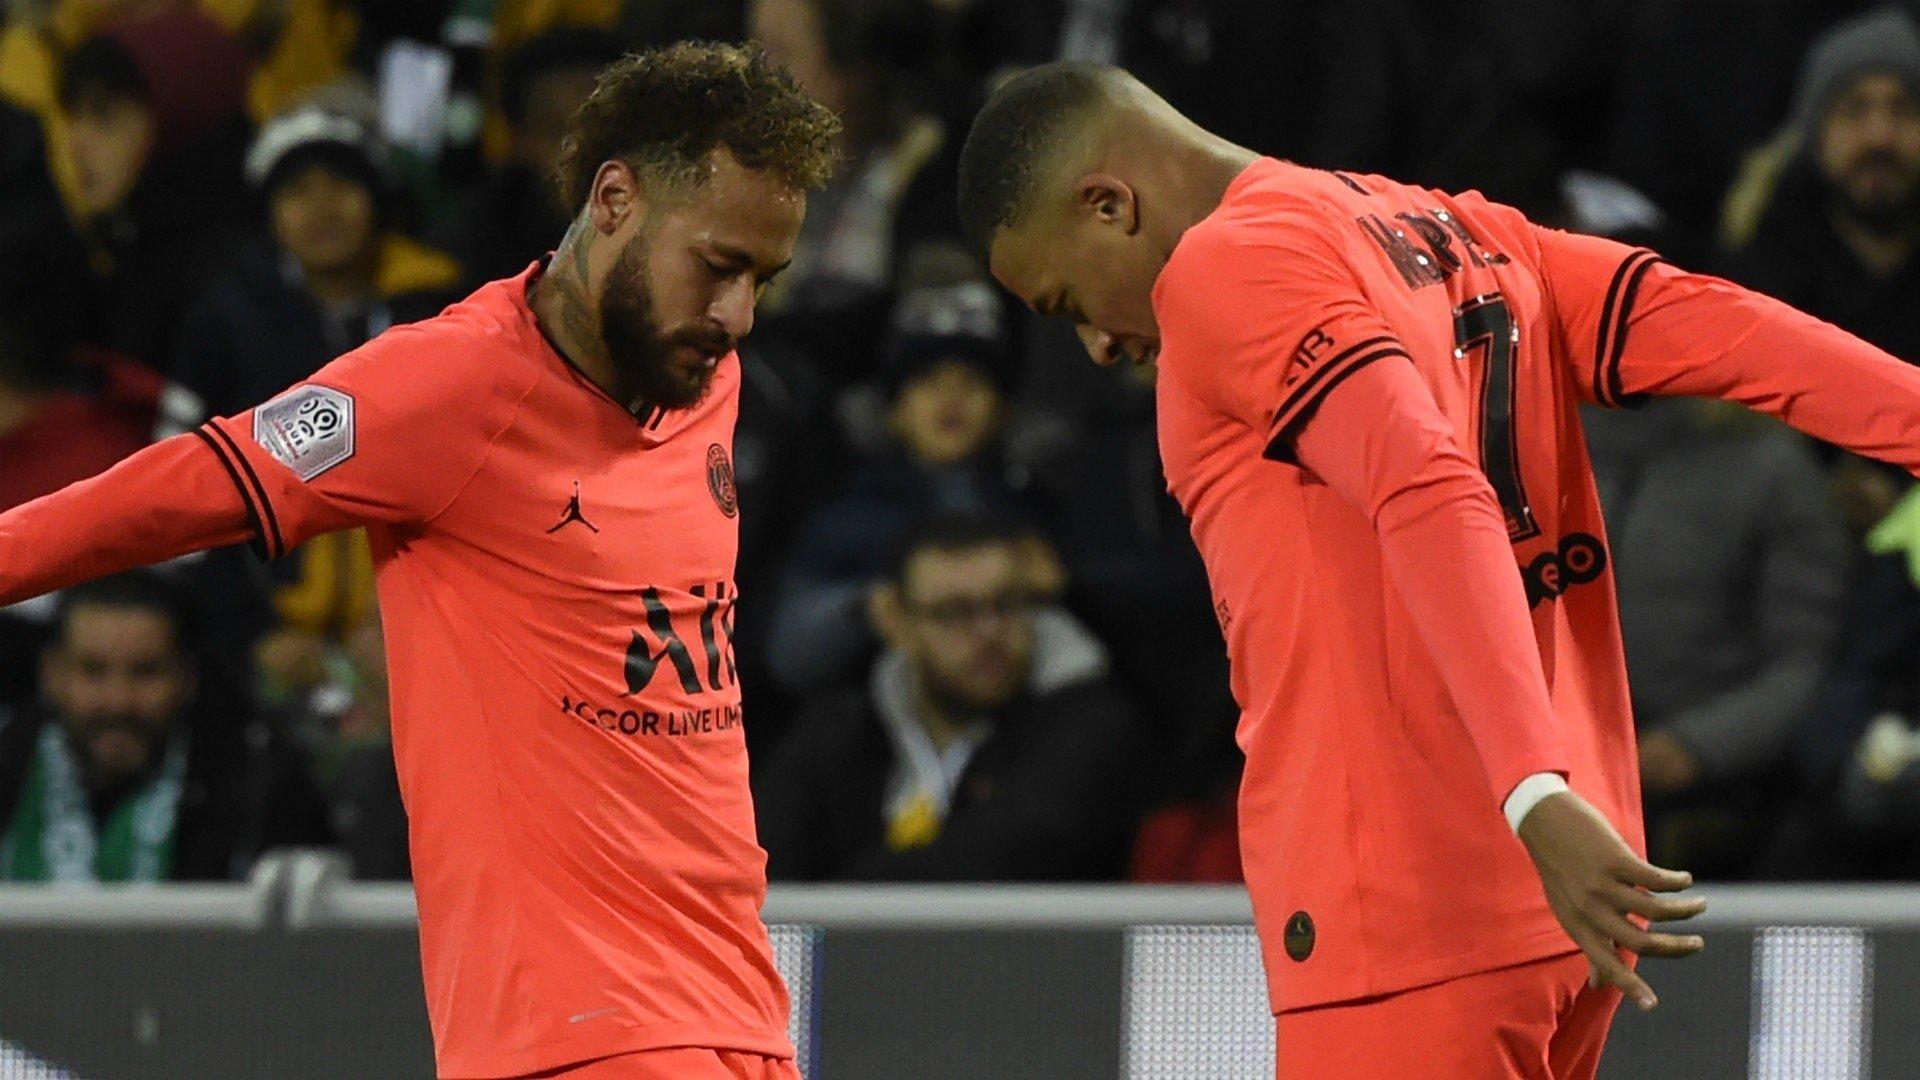 Camisa do PSG laranja 2019